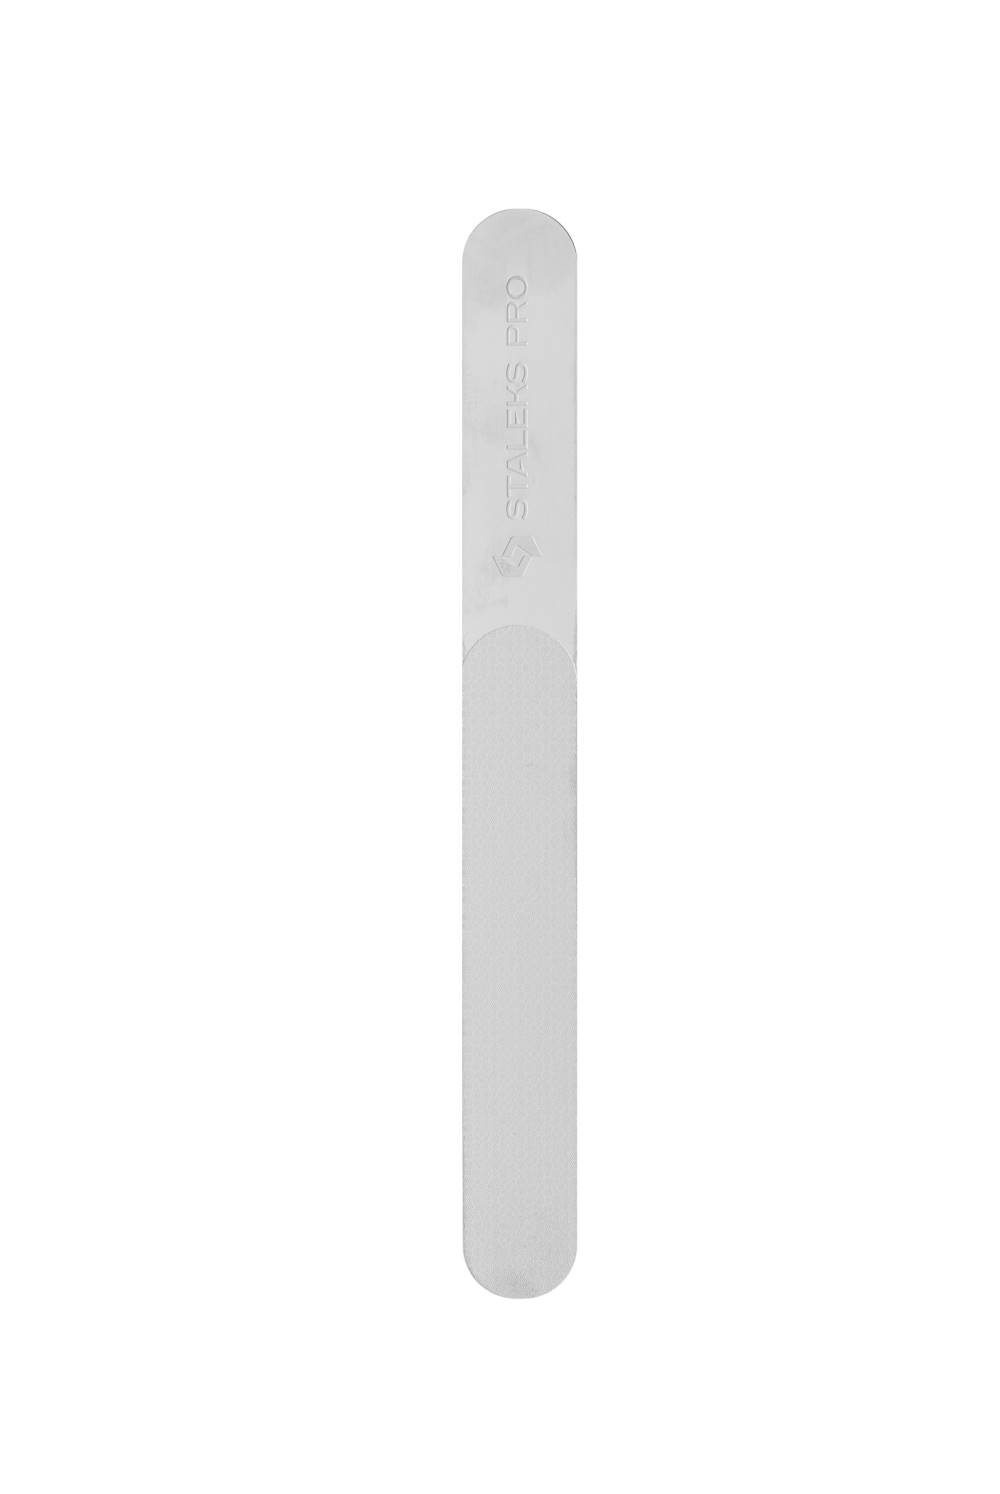 FE-11-165 Лазерная пилка для ногтей STALEKS PRO EXPERT 11 165 мм